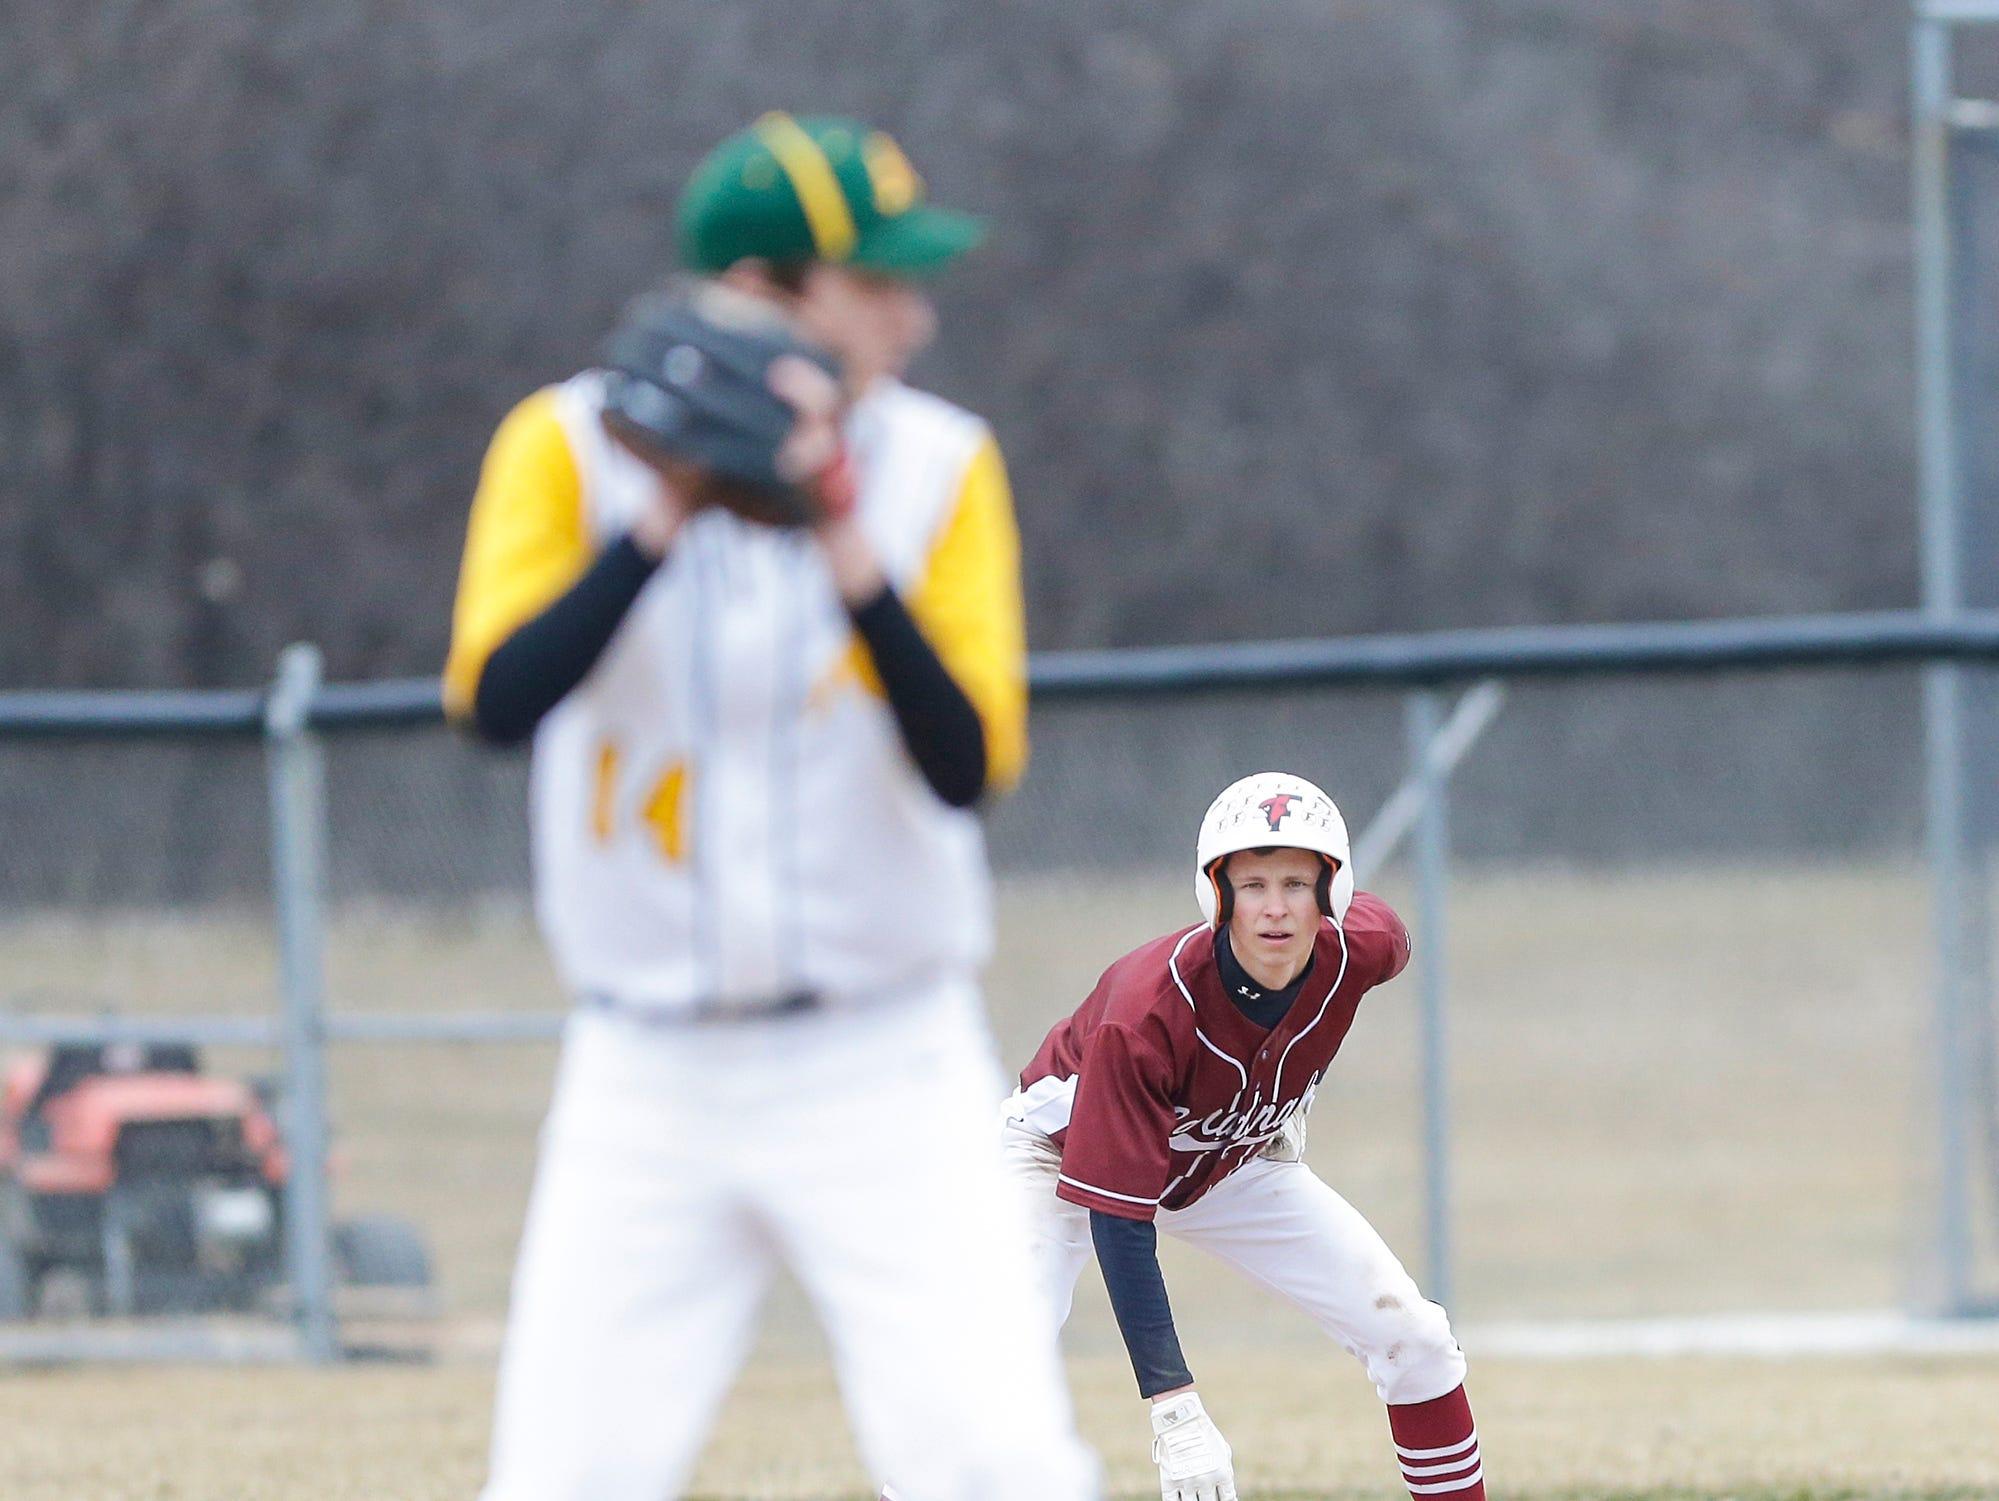 Fond du Lac High School baseball's Caden Krug keeps an eye on Ashwaubenon High School's Aaron Bliek as he leads off first base Saturday, April 6, 2019 during their game in Fond du Lac, Wis. Fond du Lac won the game 5-3. Doug Raflik/USA TODAY NETWORK-Wisconsin